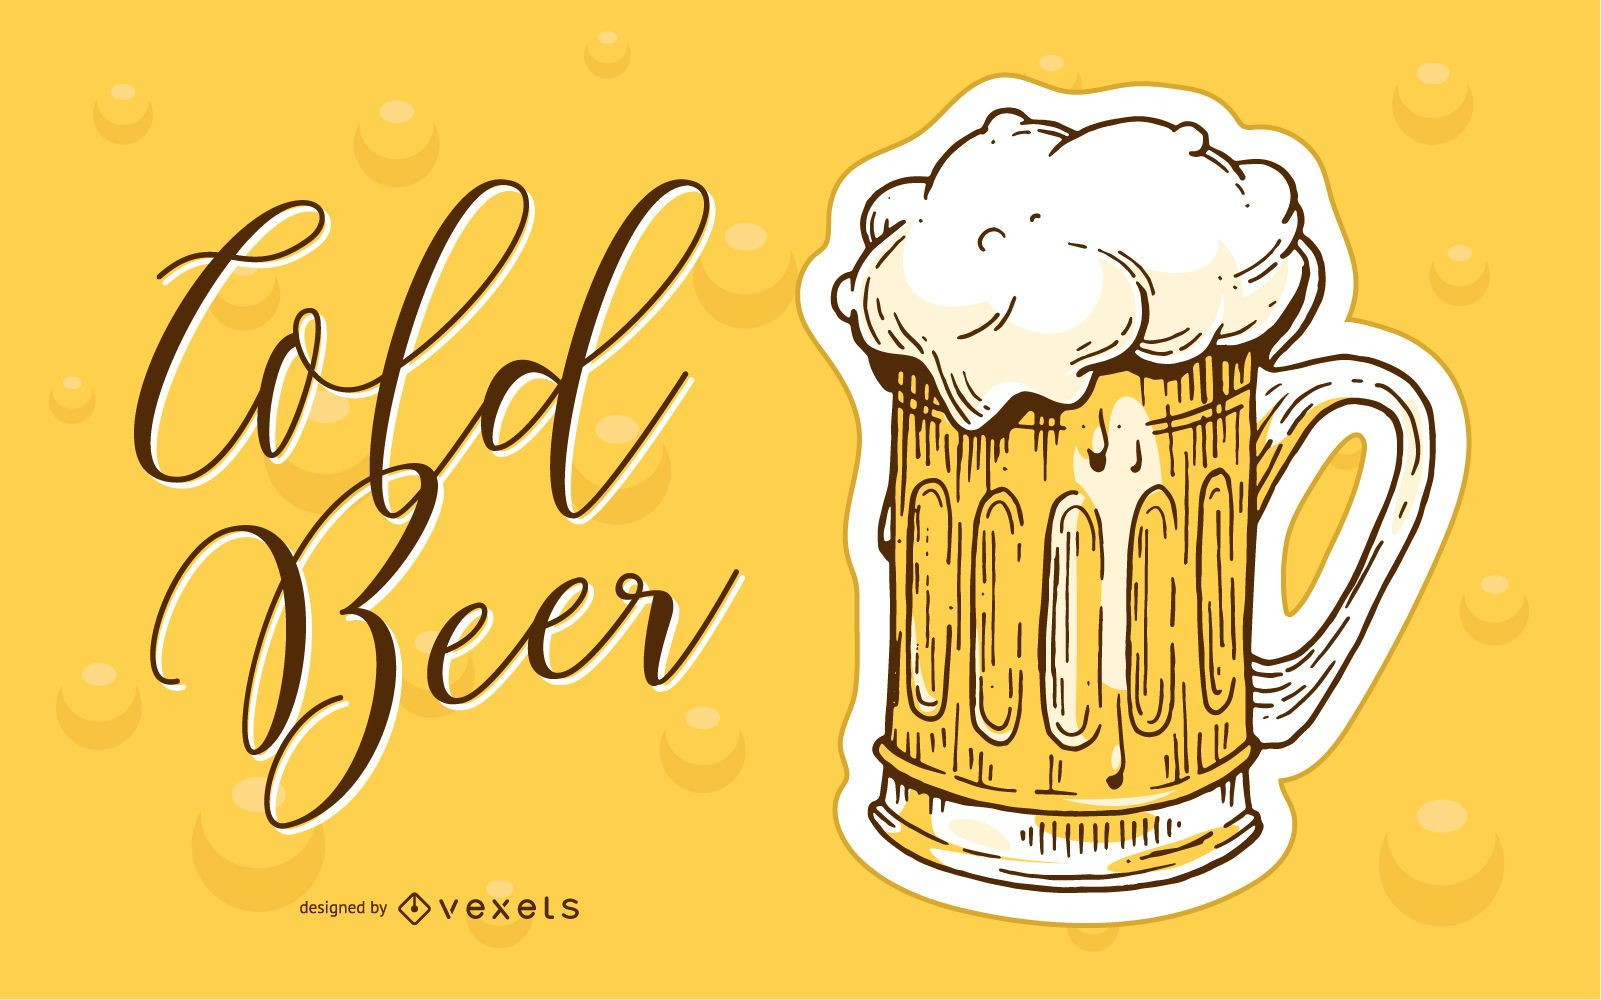 Cold beer hand drawn illustration